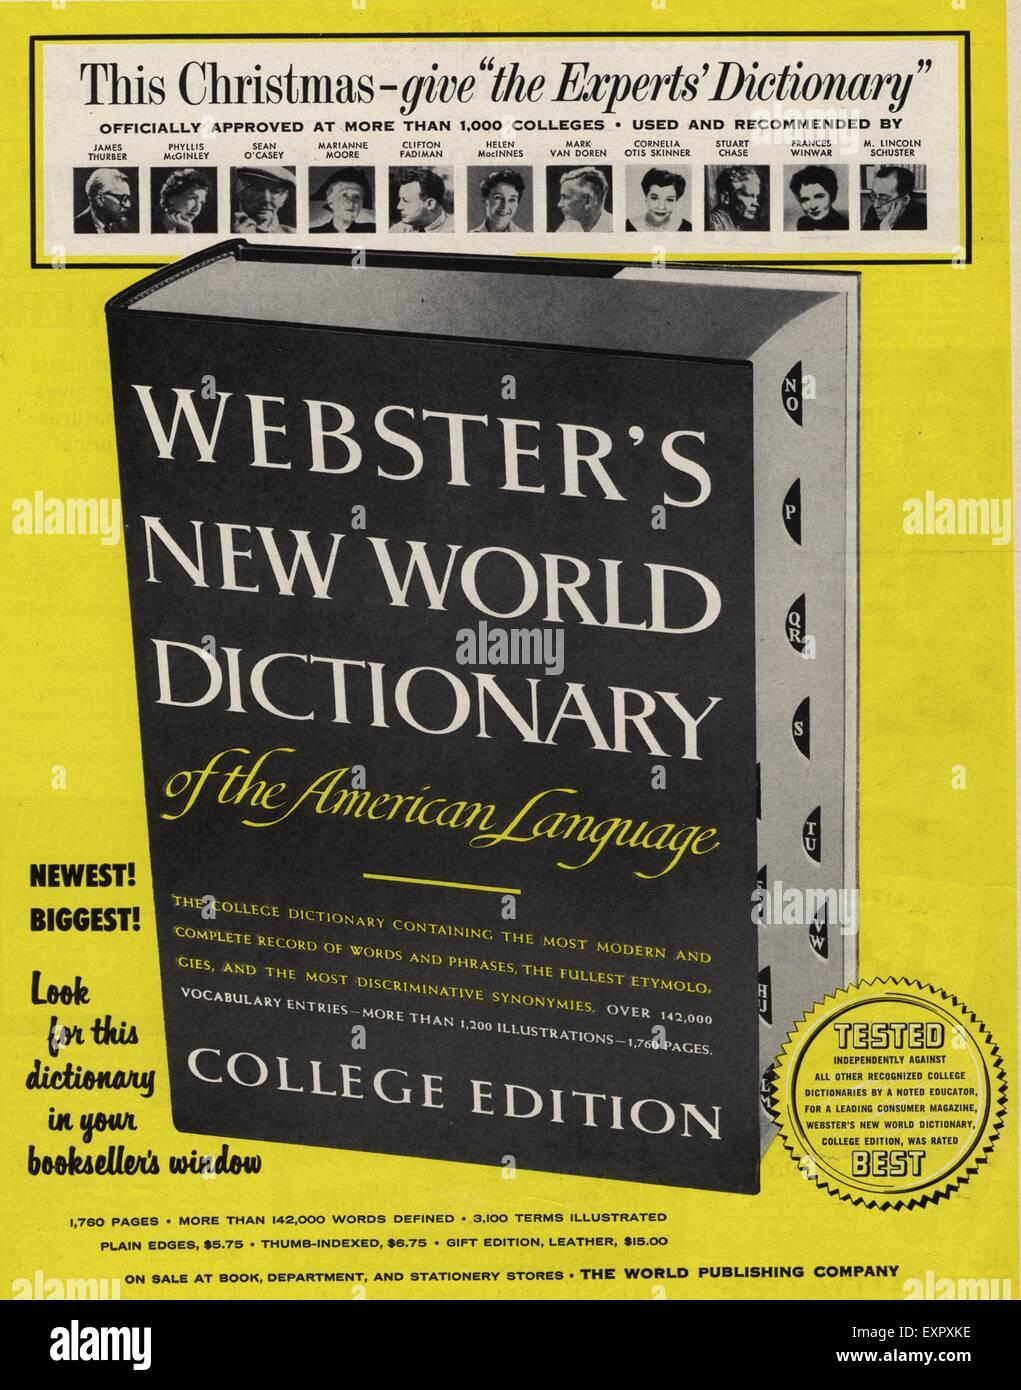 1940s USA Dictionary Magazine Advert - Stock Image